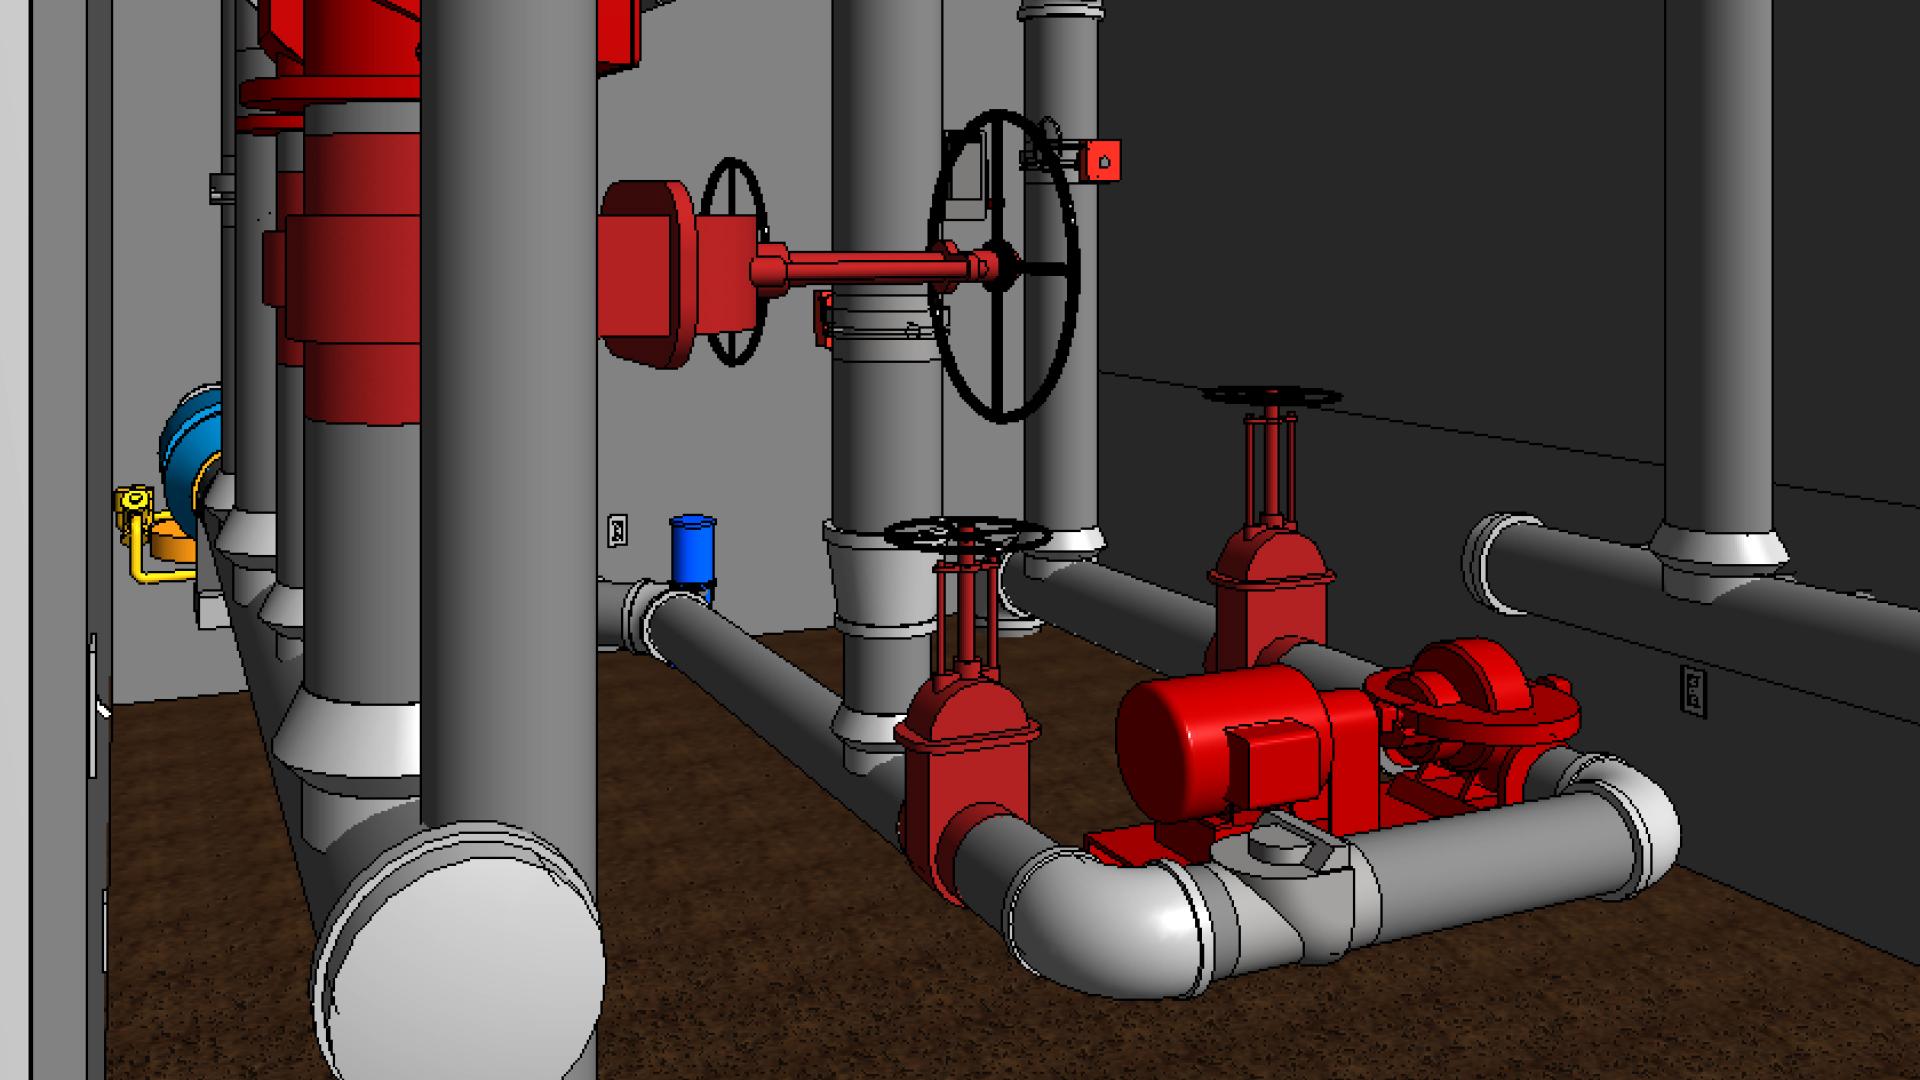 Offer] Cert Prep - Revit MEP Mechanical Plumbing Certified